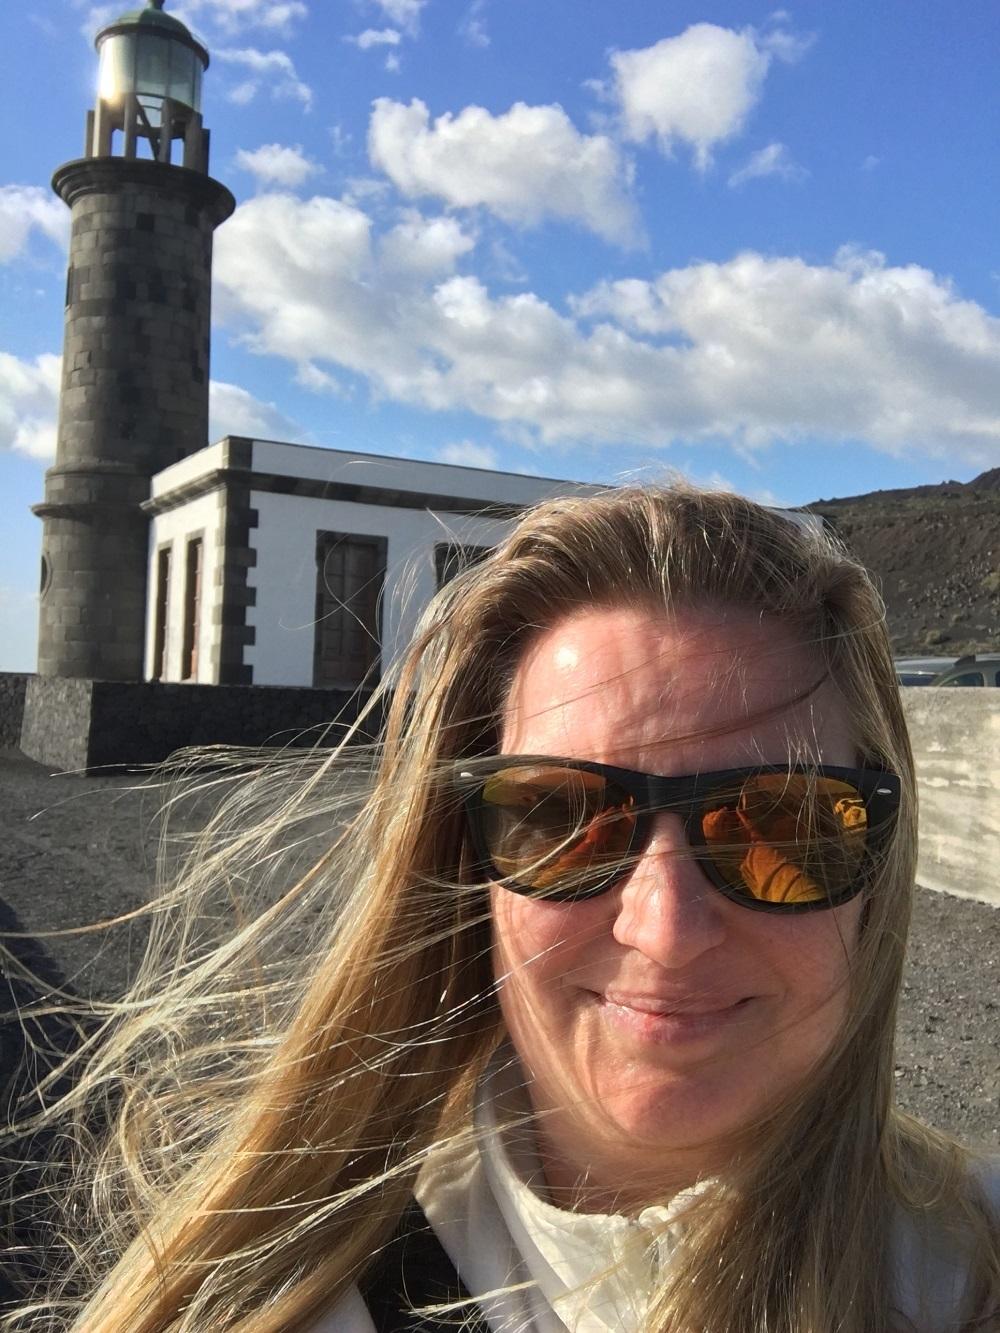 Urlaub auf La Palma Natascha Reis am Leuchtturm Salinas Fuencaliente